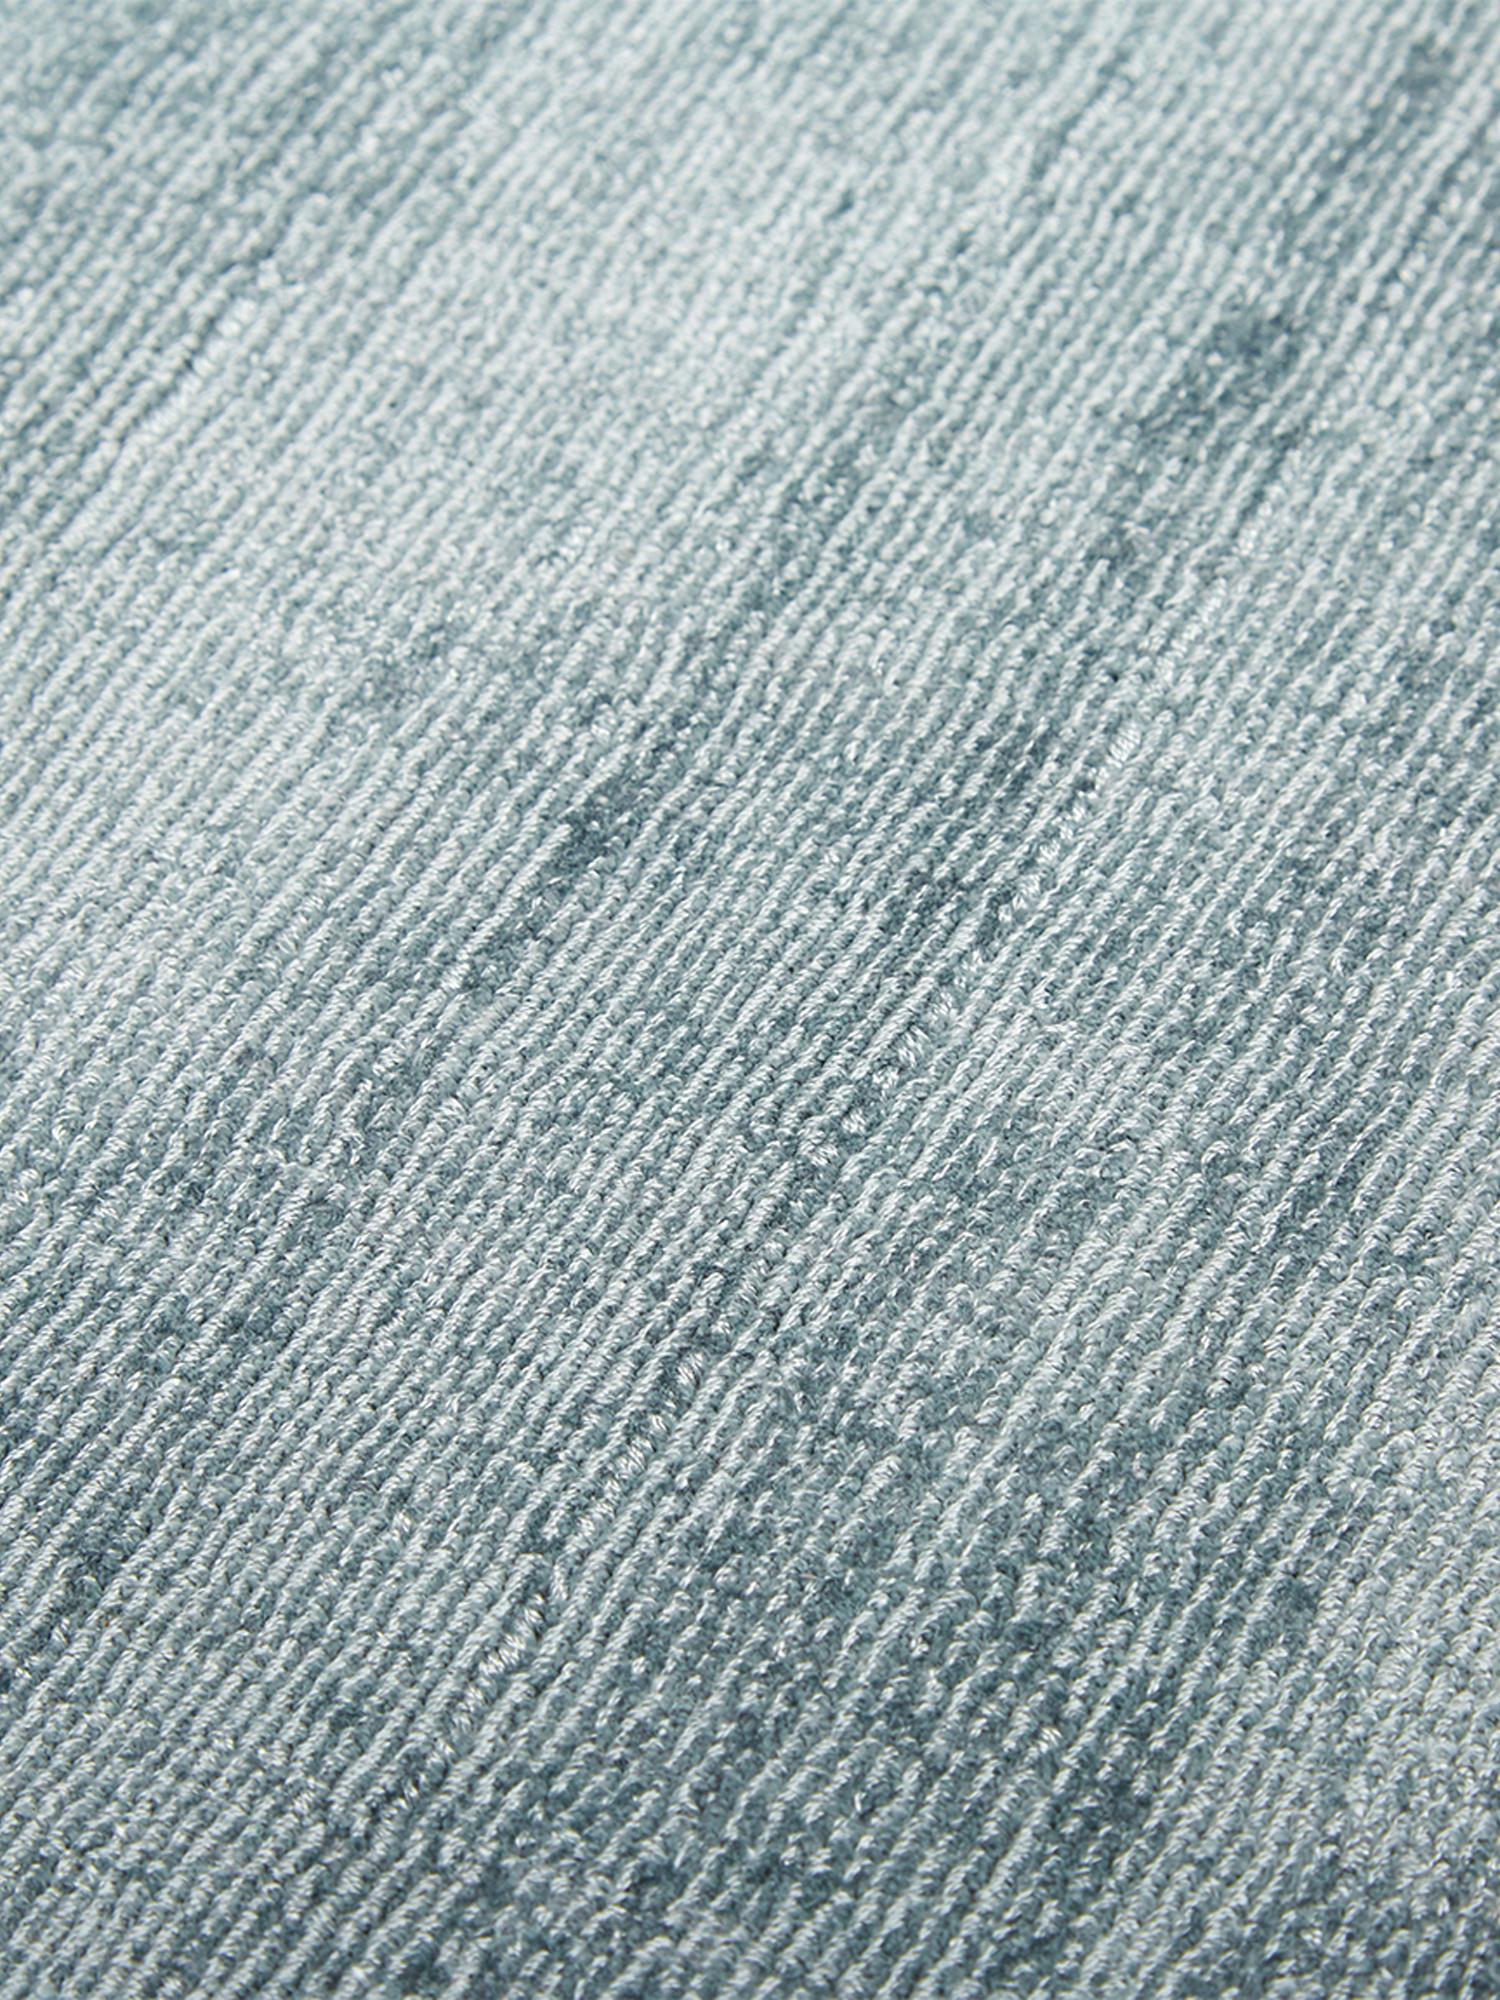 Handgewebter Viskoseteppich Jane in Eisblau, Flor: 100% Viskose, Eisblau, B 160 x L 230 cm (Größe M)